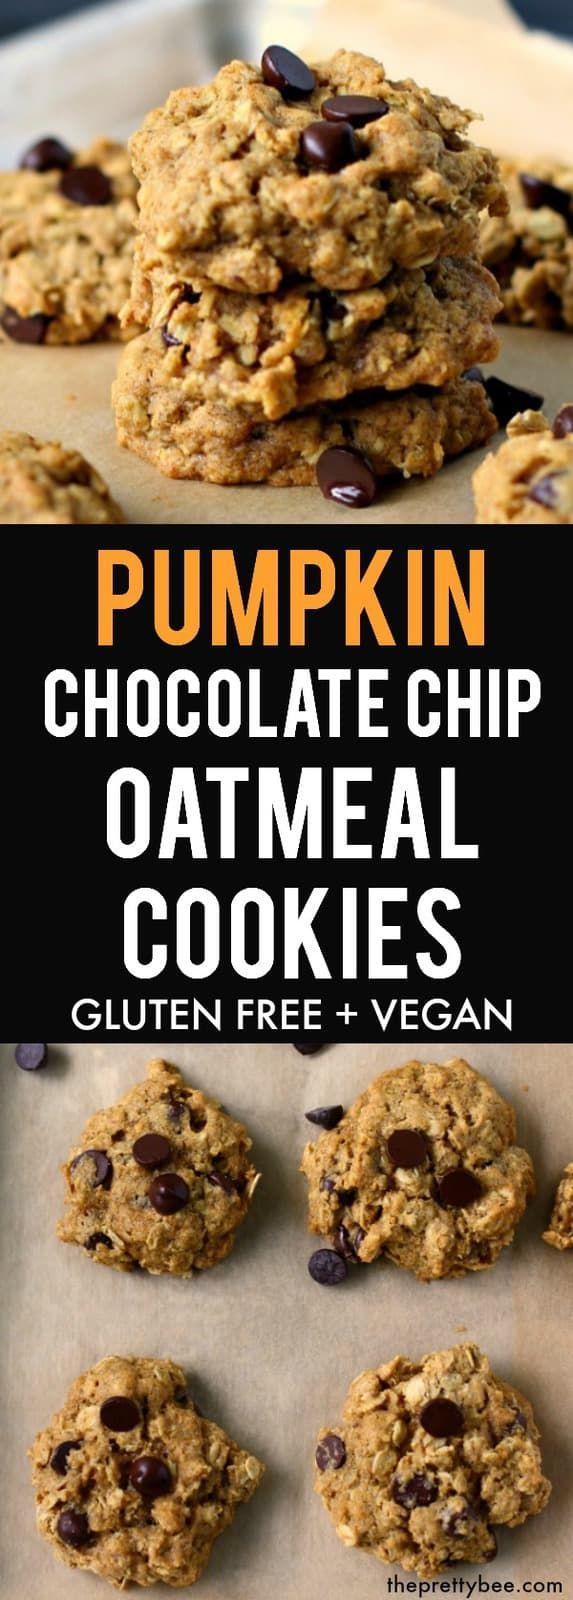 Pumpkin Chocolate Chip Oatmeal Cookies #chocolatechipcookies